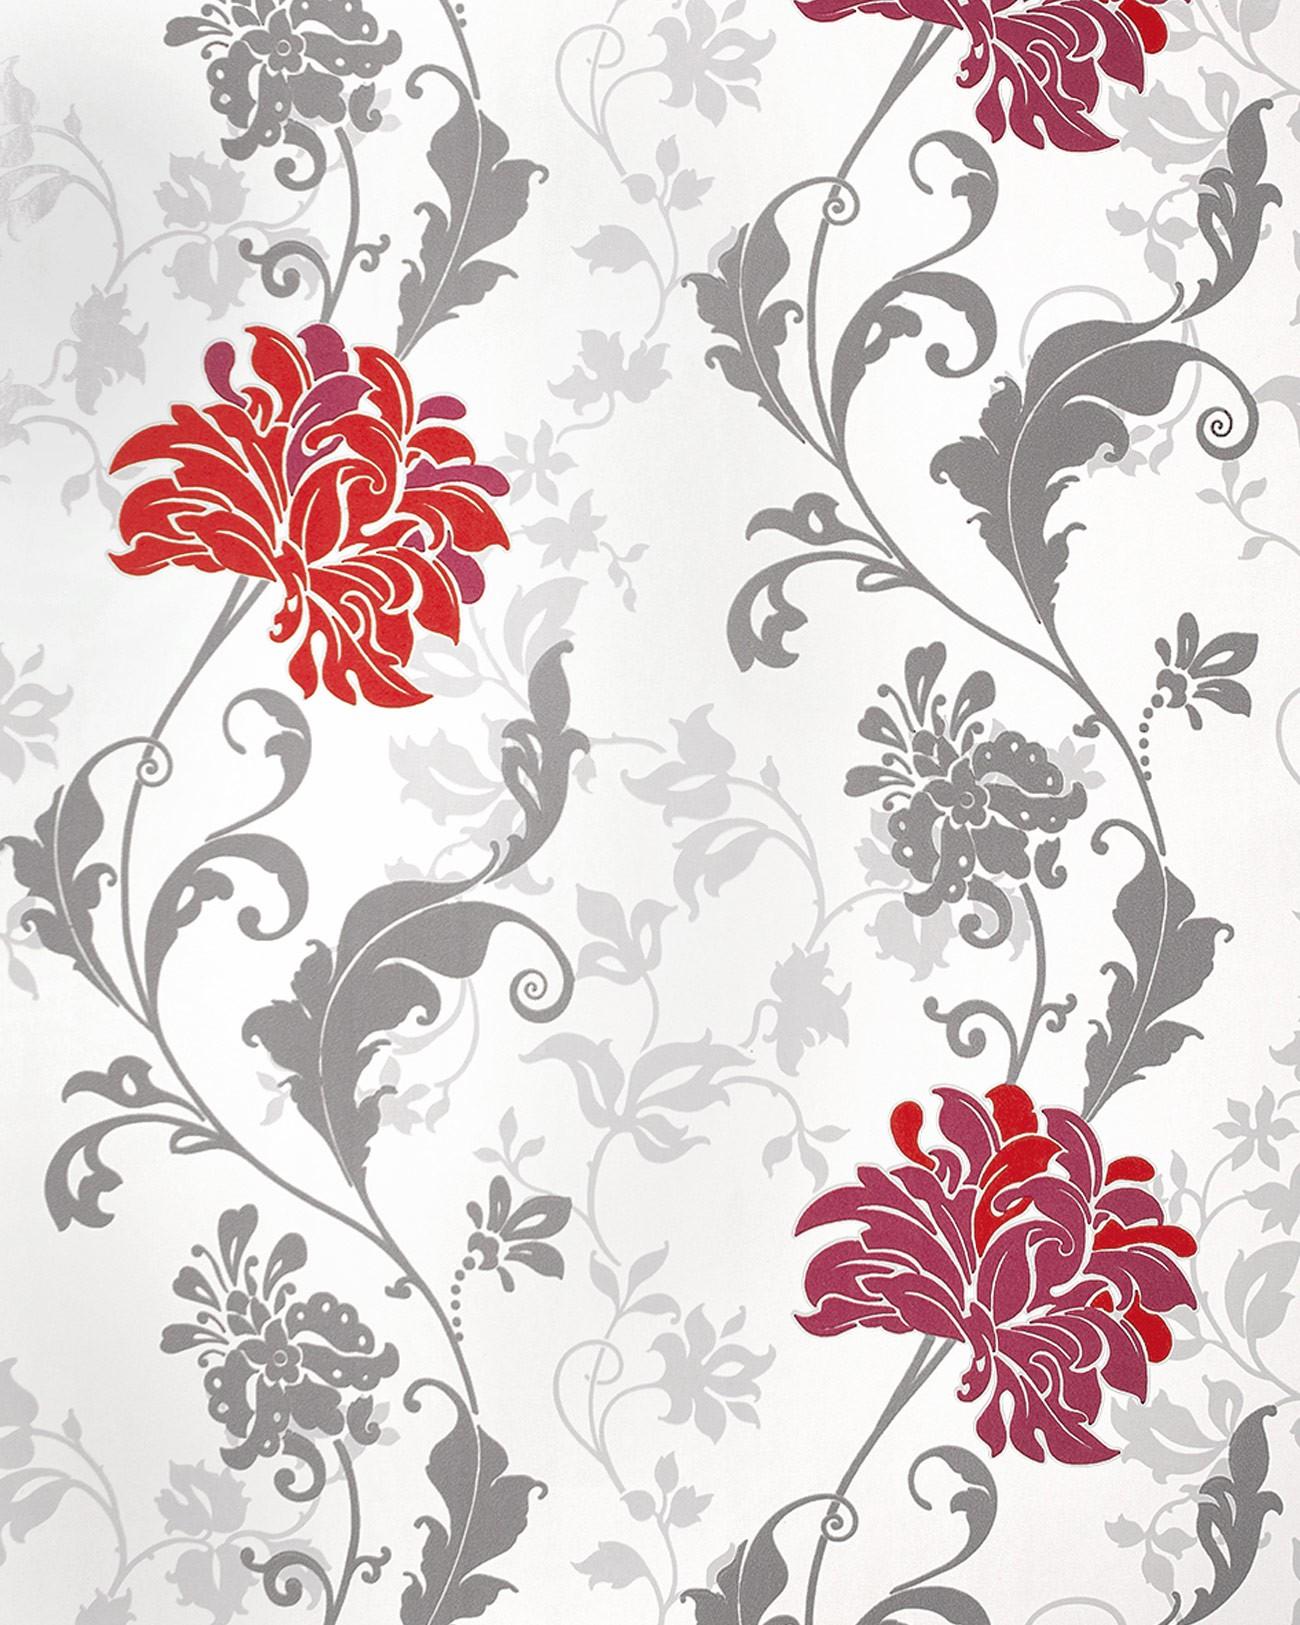 Flowers wall covering luxury design edem 833 25 floral wallpaper flowers wall covering luxury design edem 833 25 floral wallpaper flowers leaves red bordeaux grey white 70 cm mightylinksfo